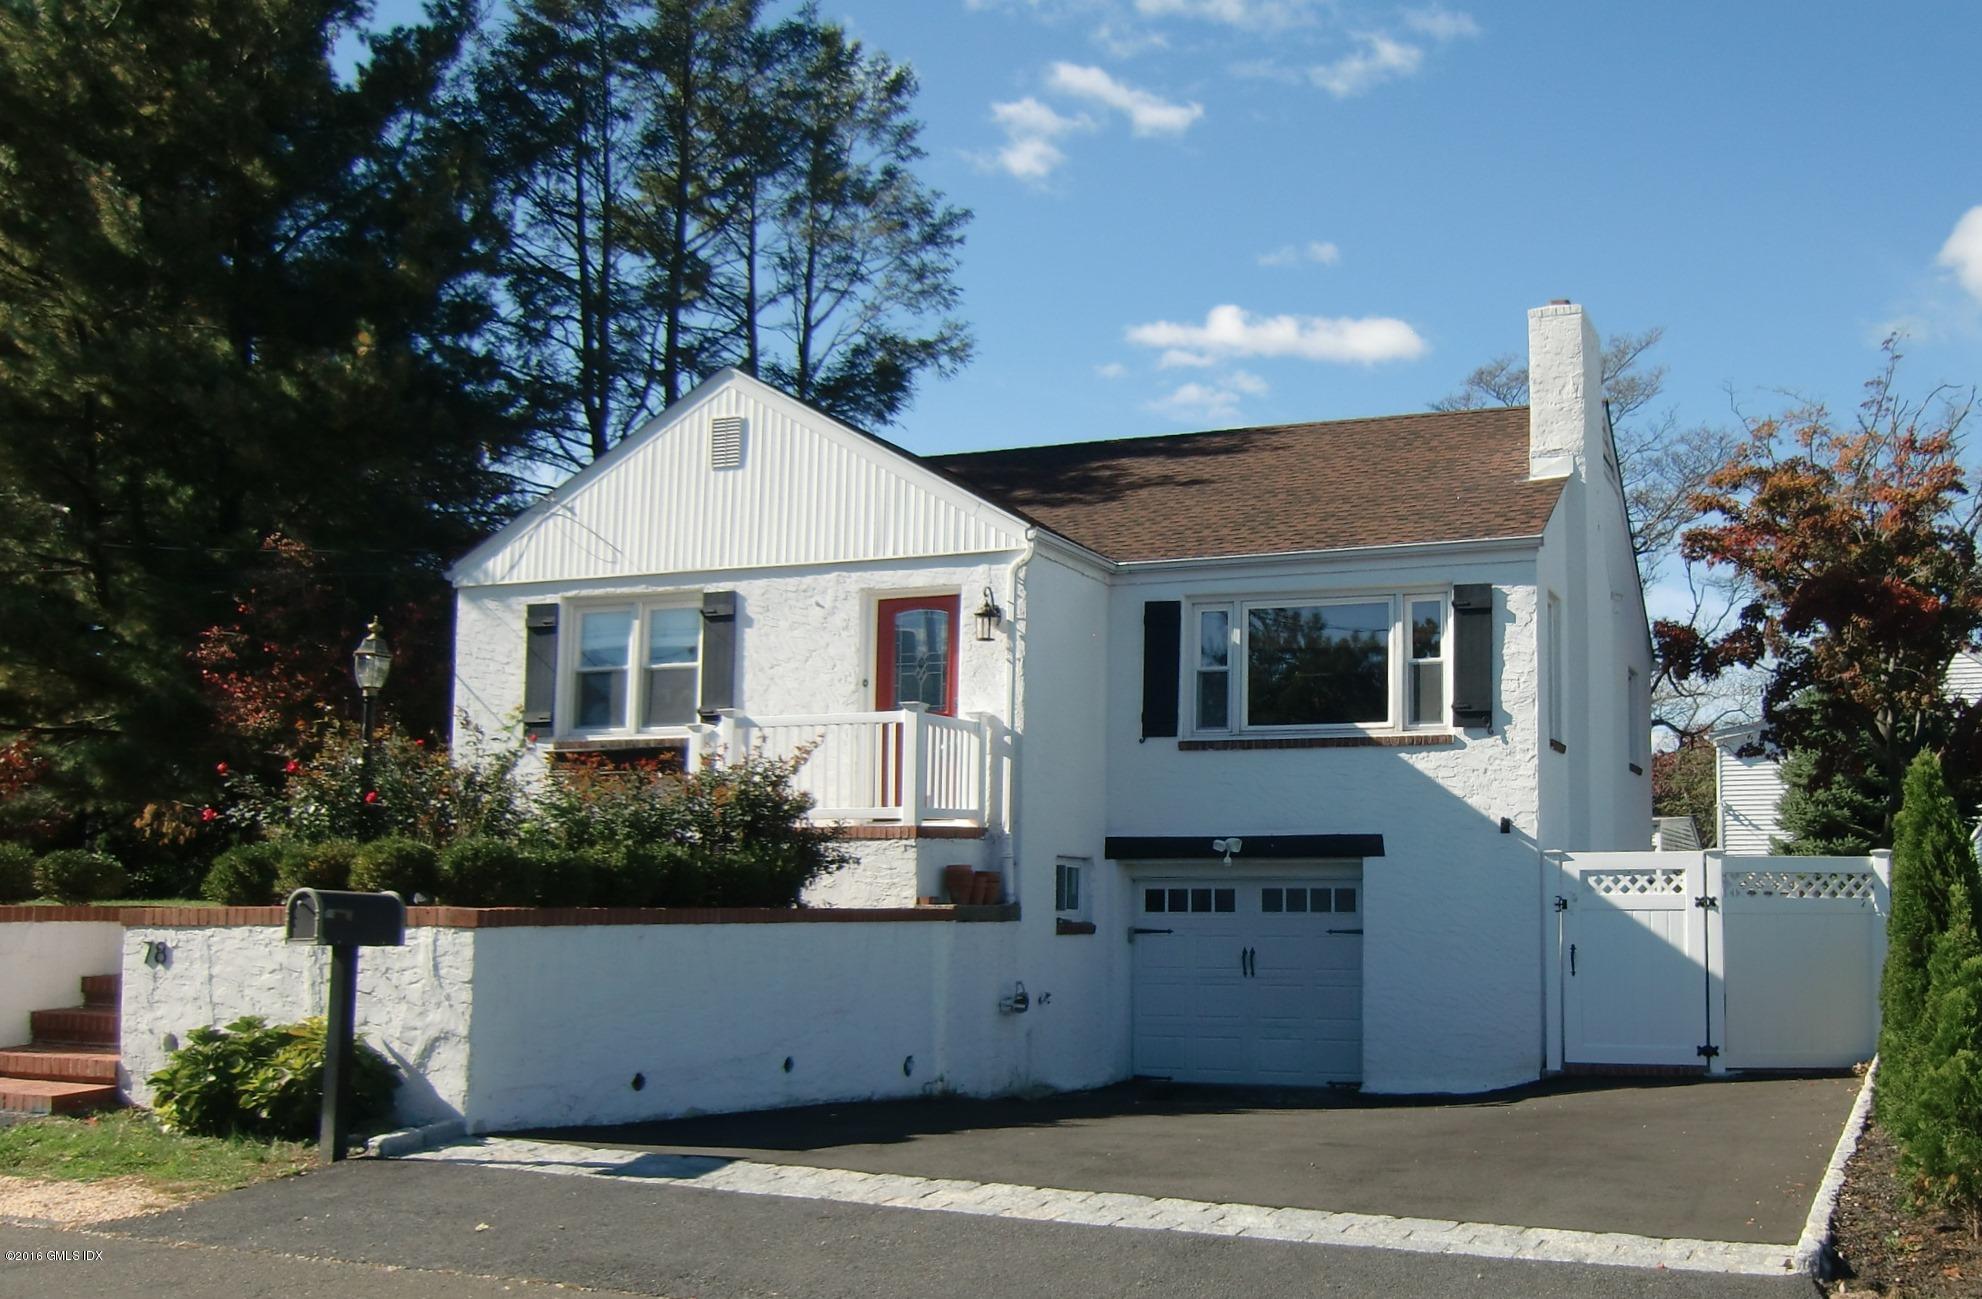 78 Josephine Evaristo Avenue,Greenwich,Connecticut 06830,2 Bedrooms Bedrooms,2 BathroomsBathrooms,Single family,Josephine Evaristo,108339